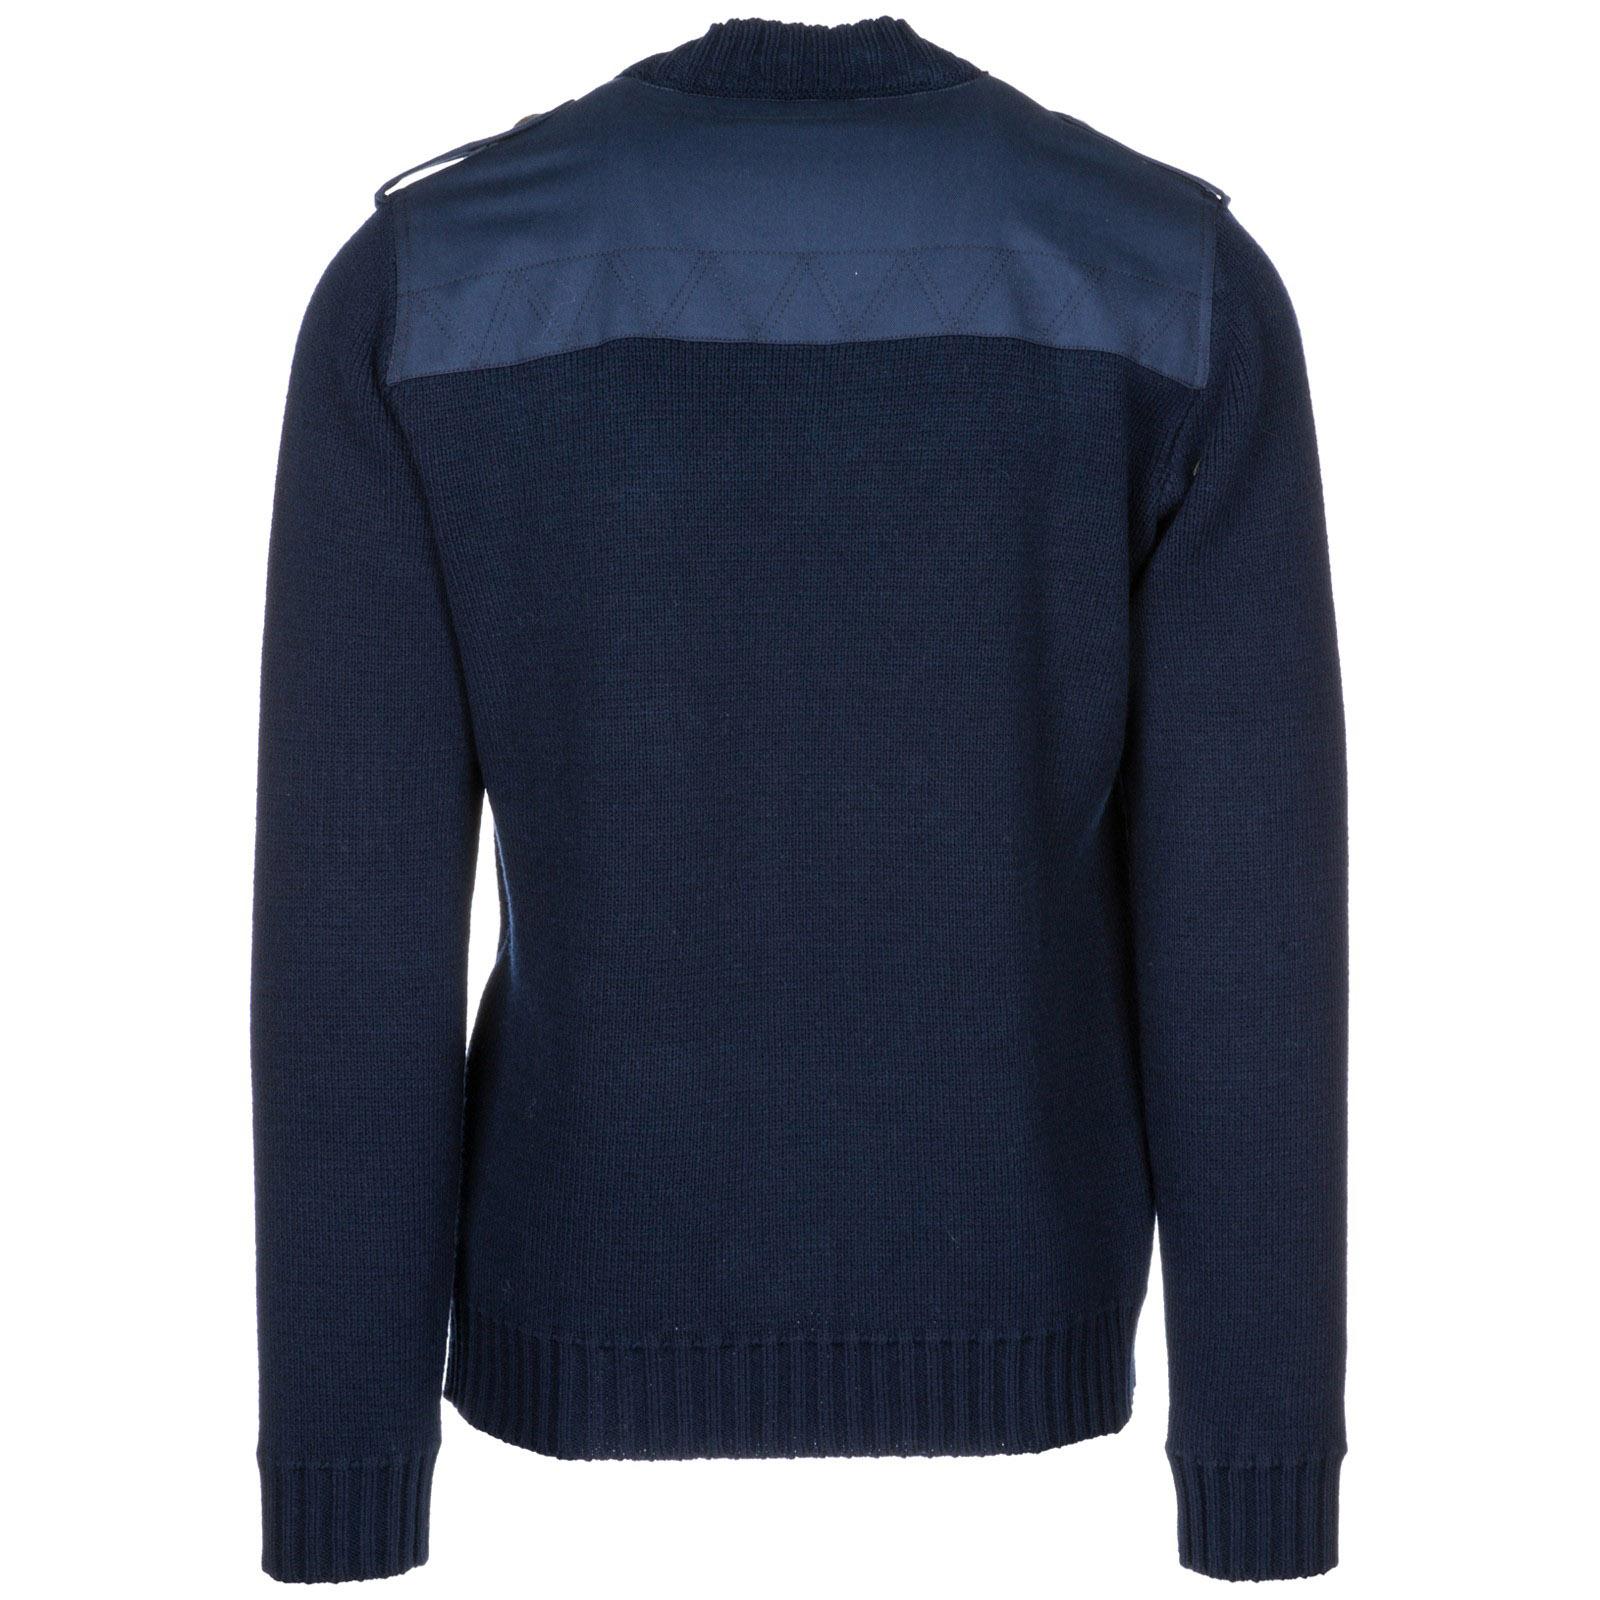 Pull Versace Jeans B5GSB813 blu   FRMODA.com 50145255447